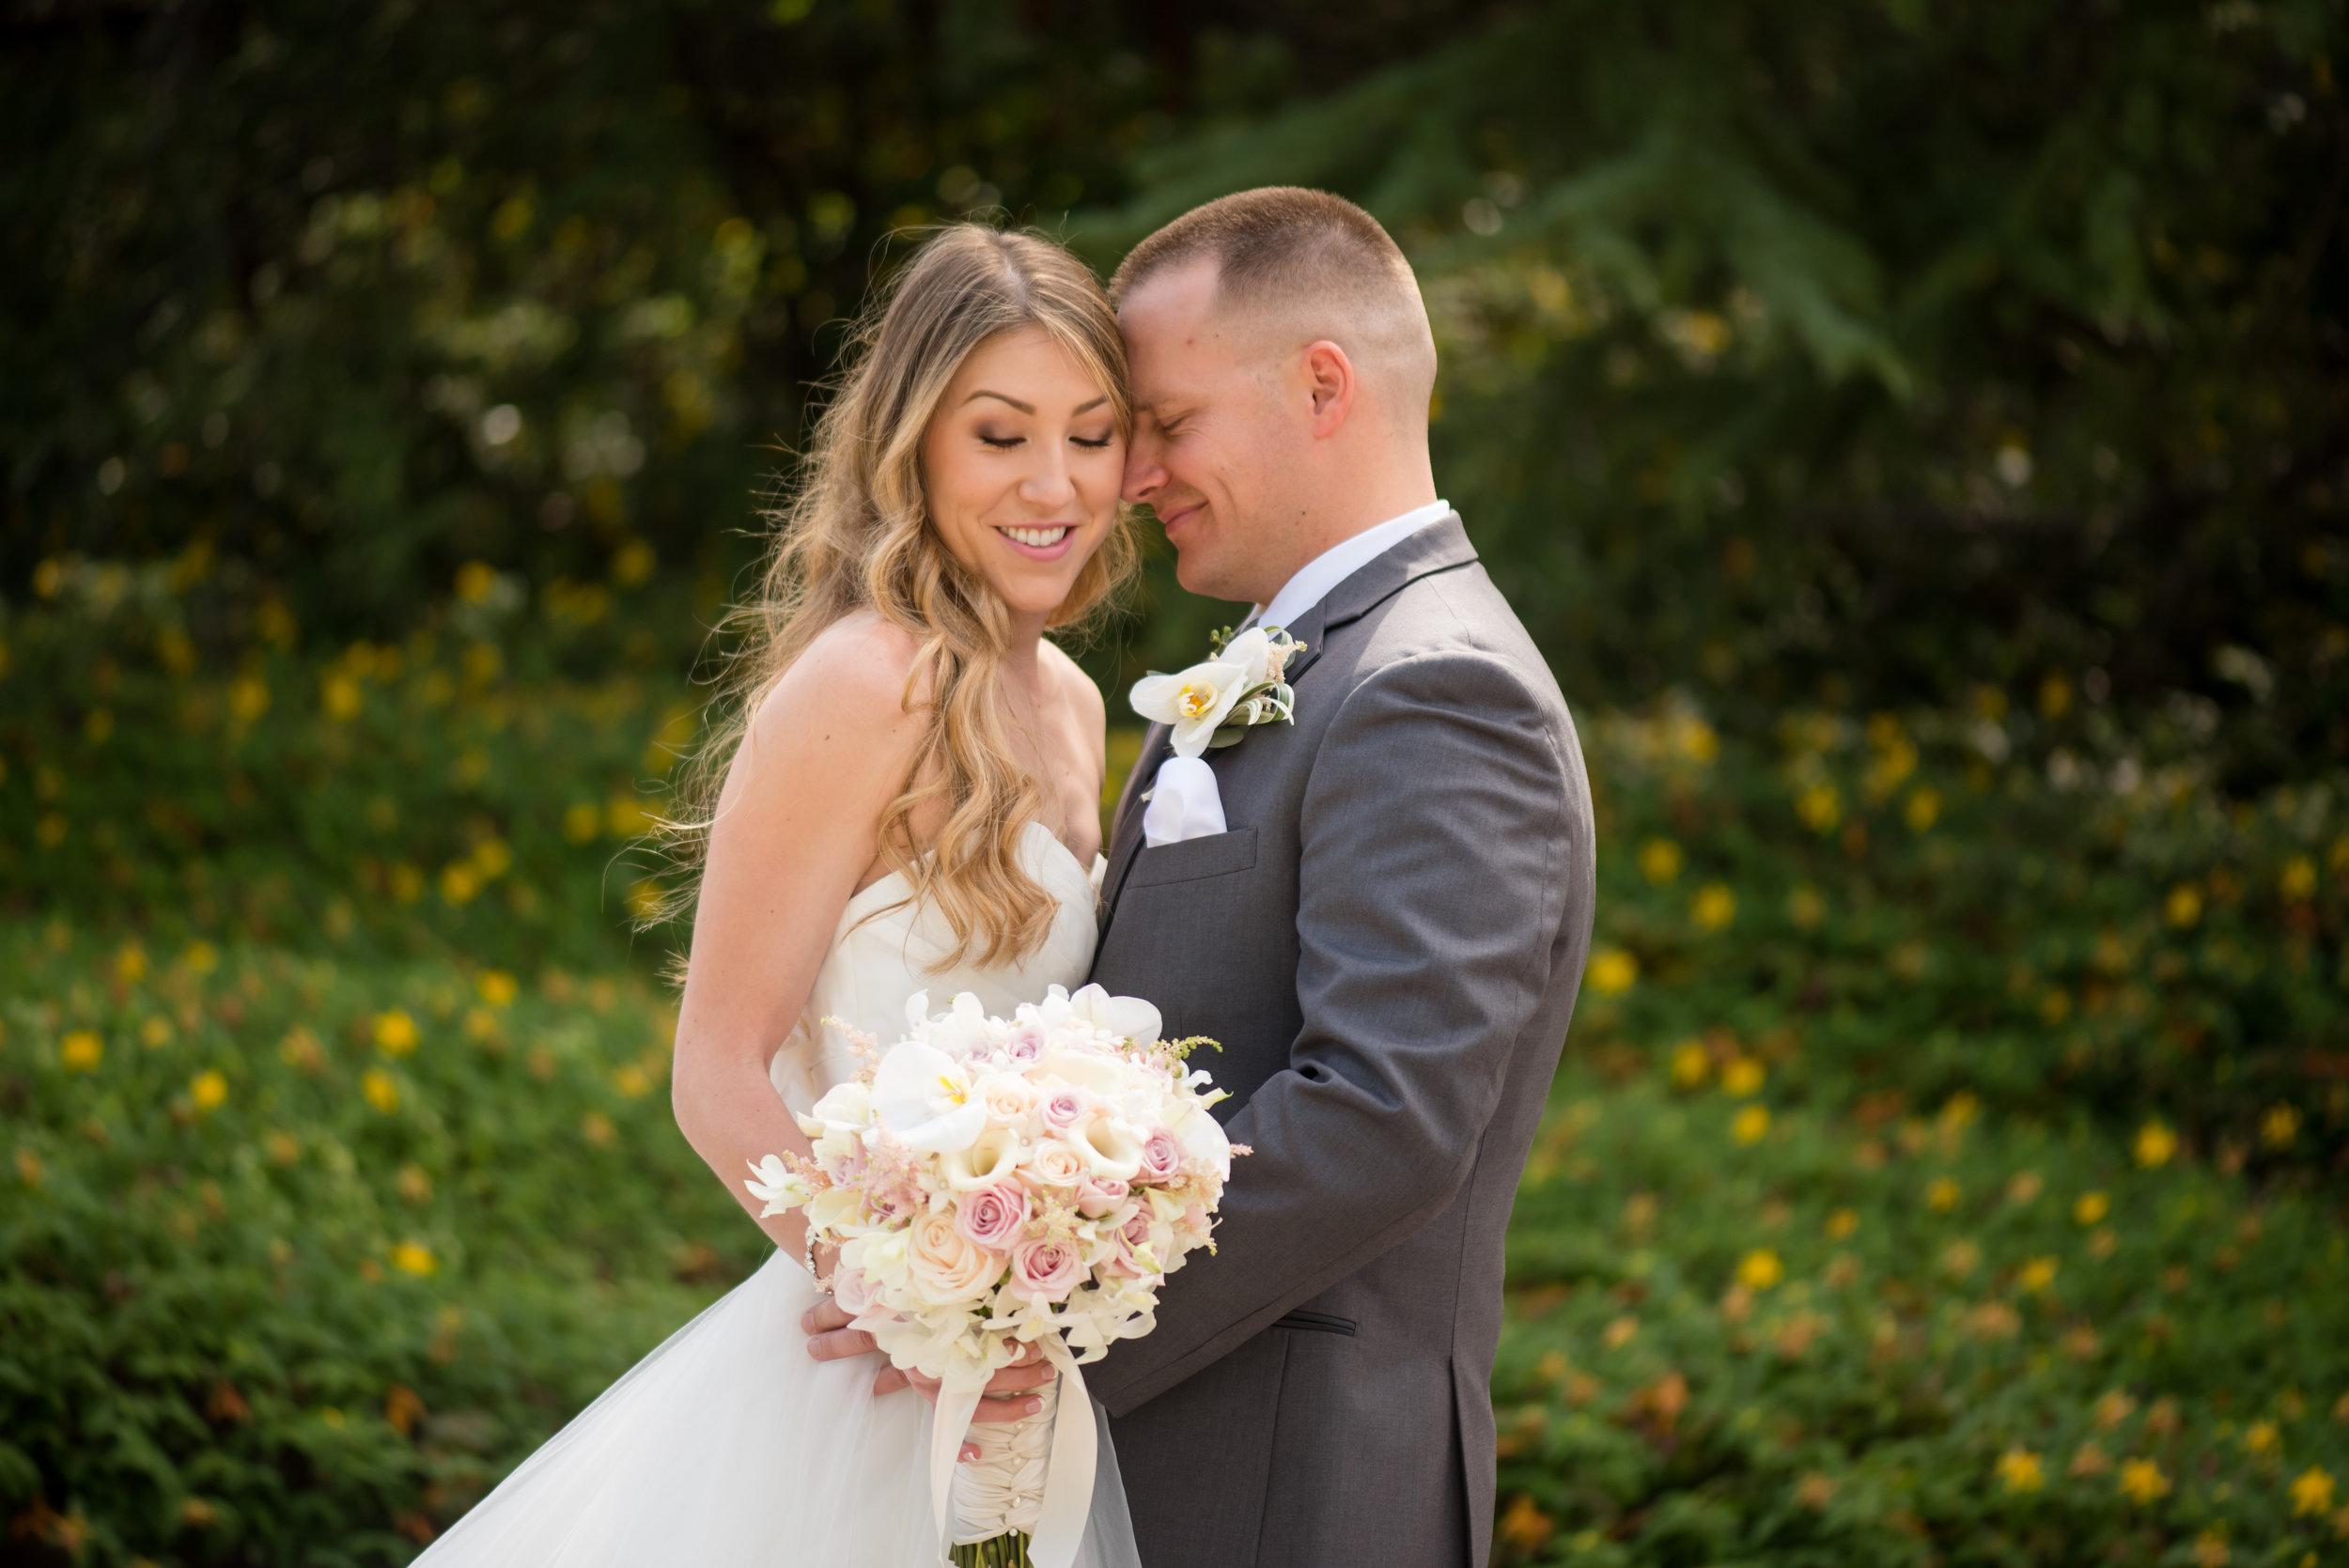 nicole-luke-011-onte-verde-inn-foresthill-wedding-photographer-katherine-nicole-photography.JPG